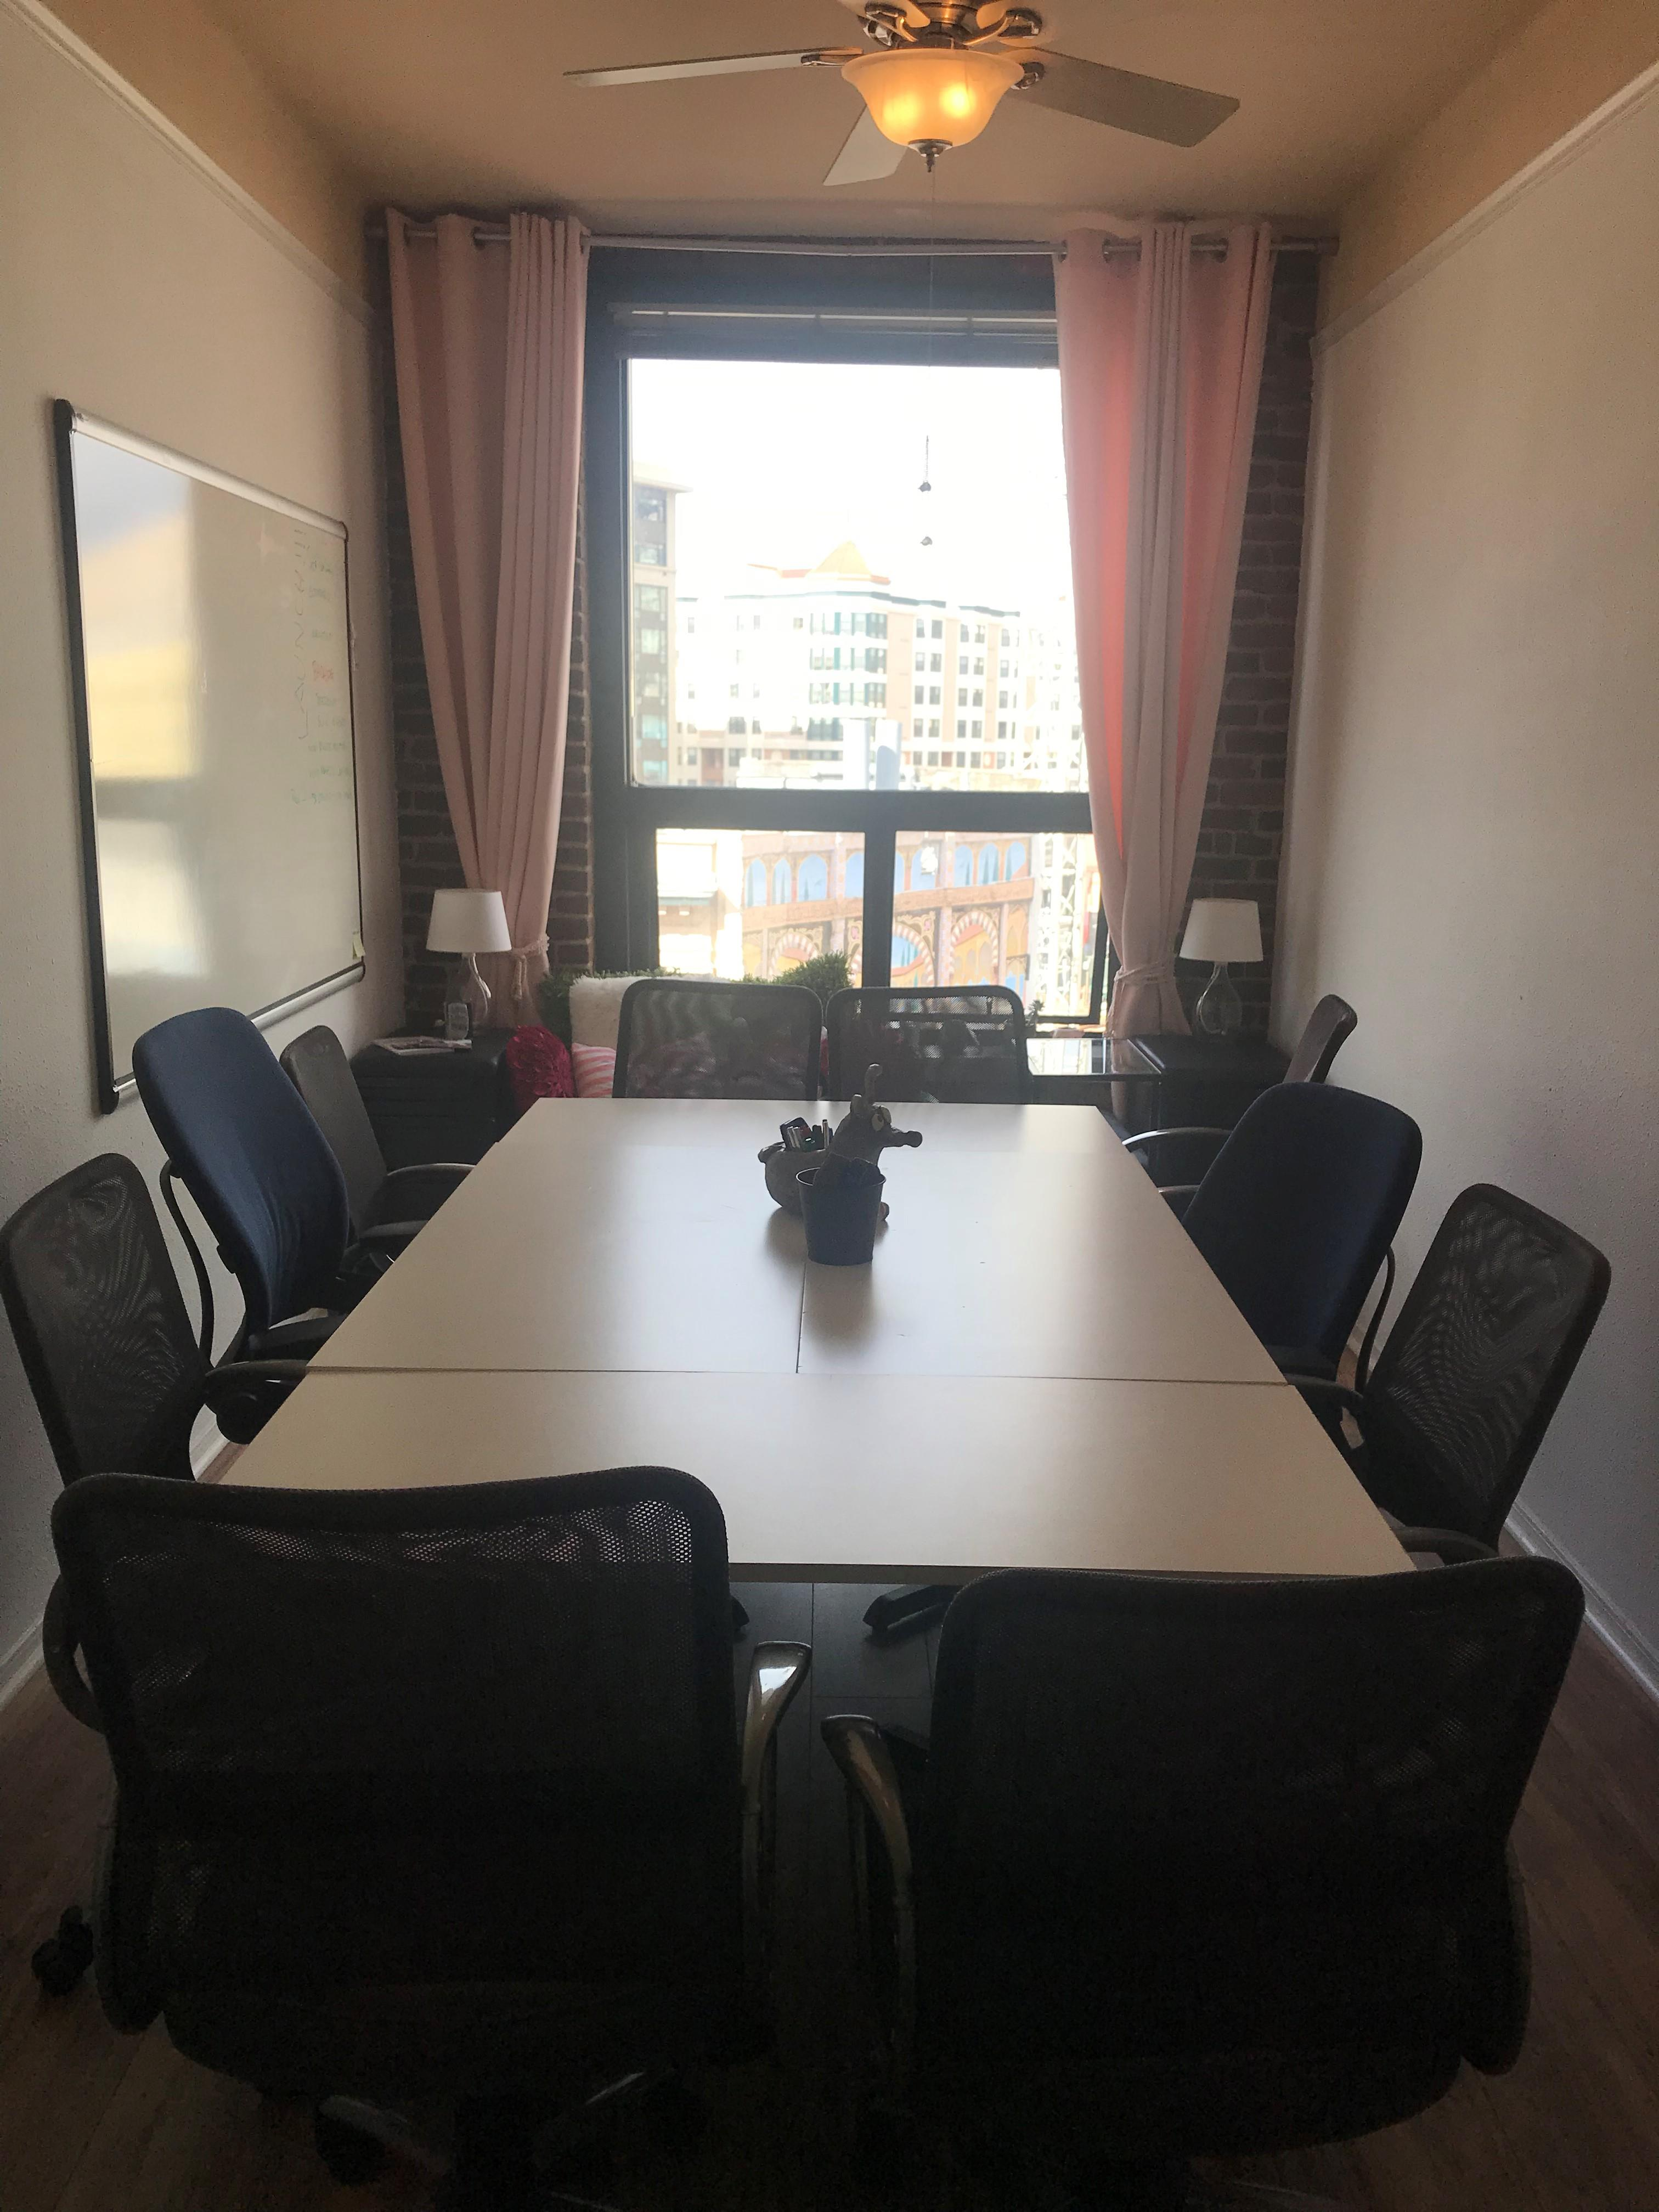 champaign HQ - Meeting Room